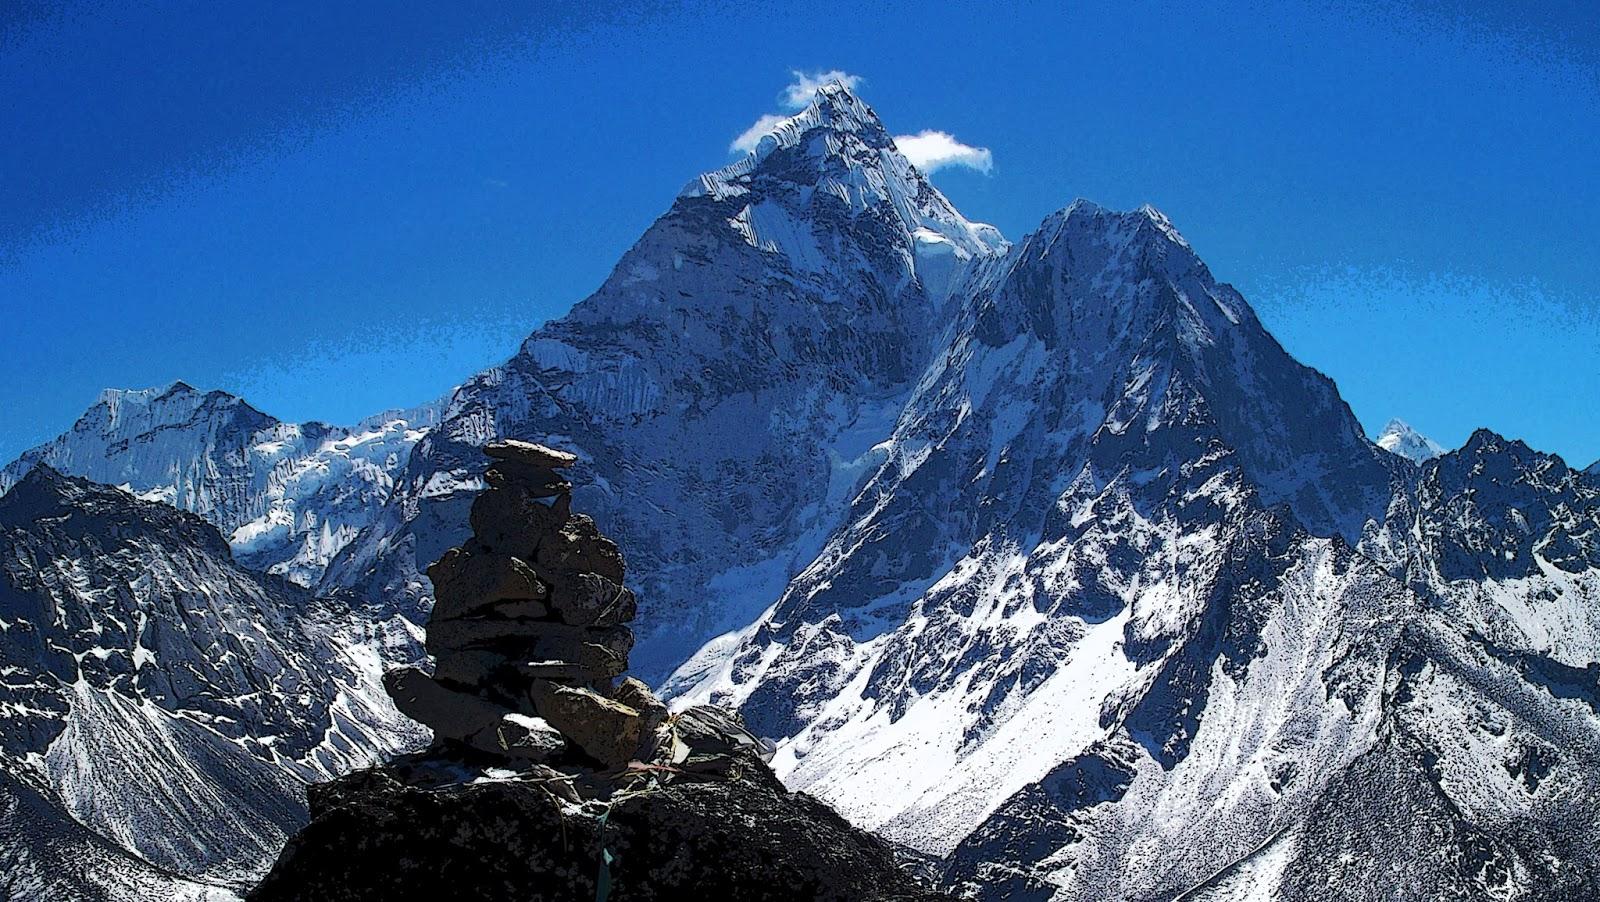 Mount Manaslu - 15 Highest Peaks in the World